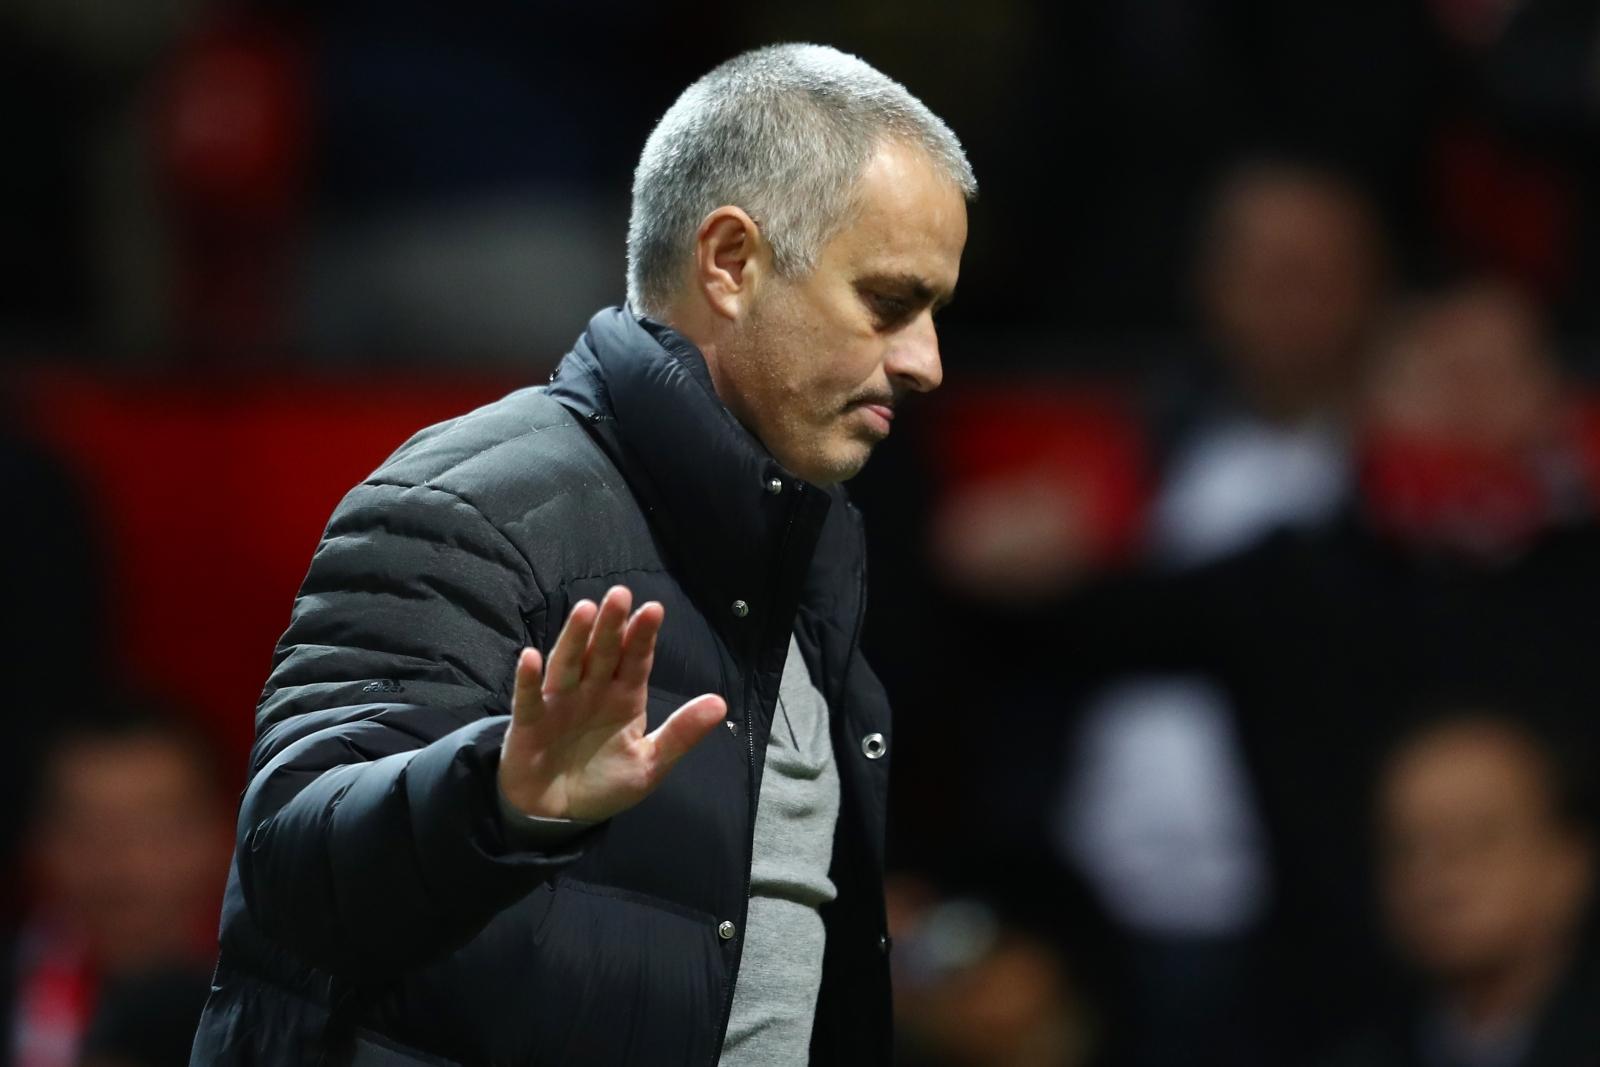 Jose mourinho technicolor overcoat